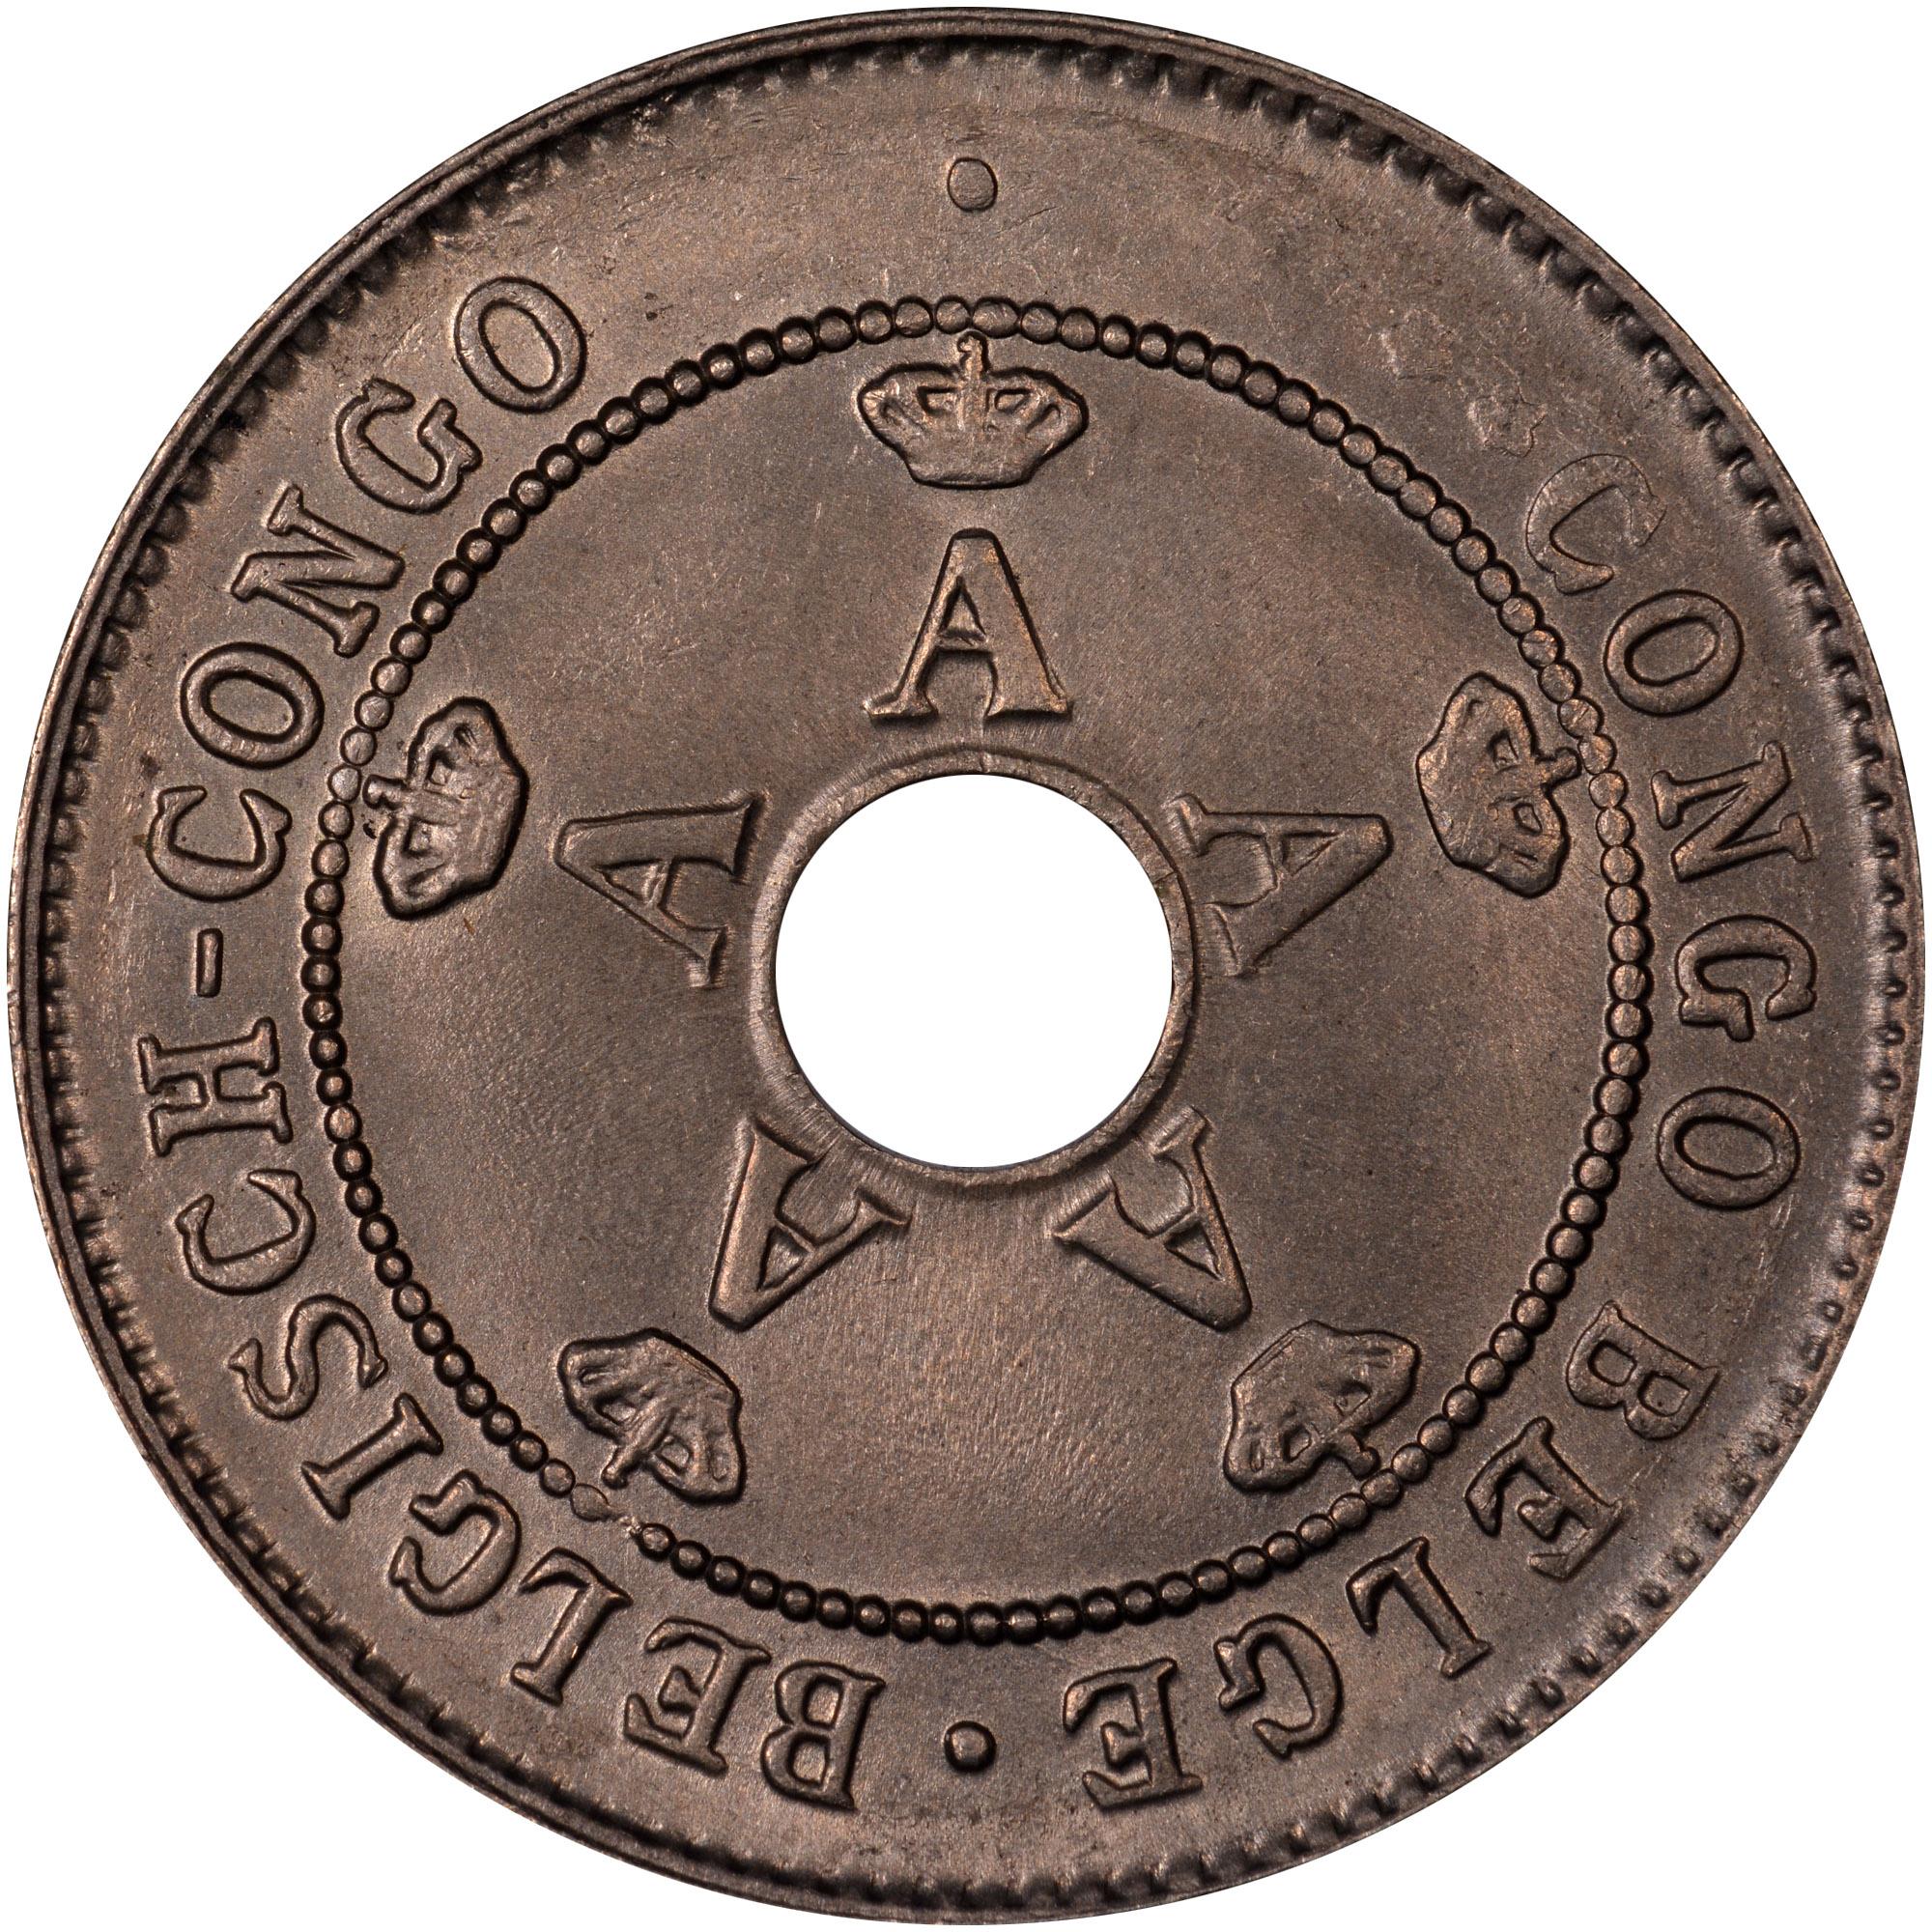 1910-1928/7 Belgian Congo 10 Centimes obverse